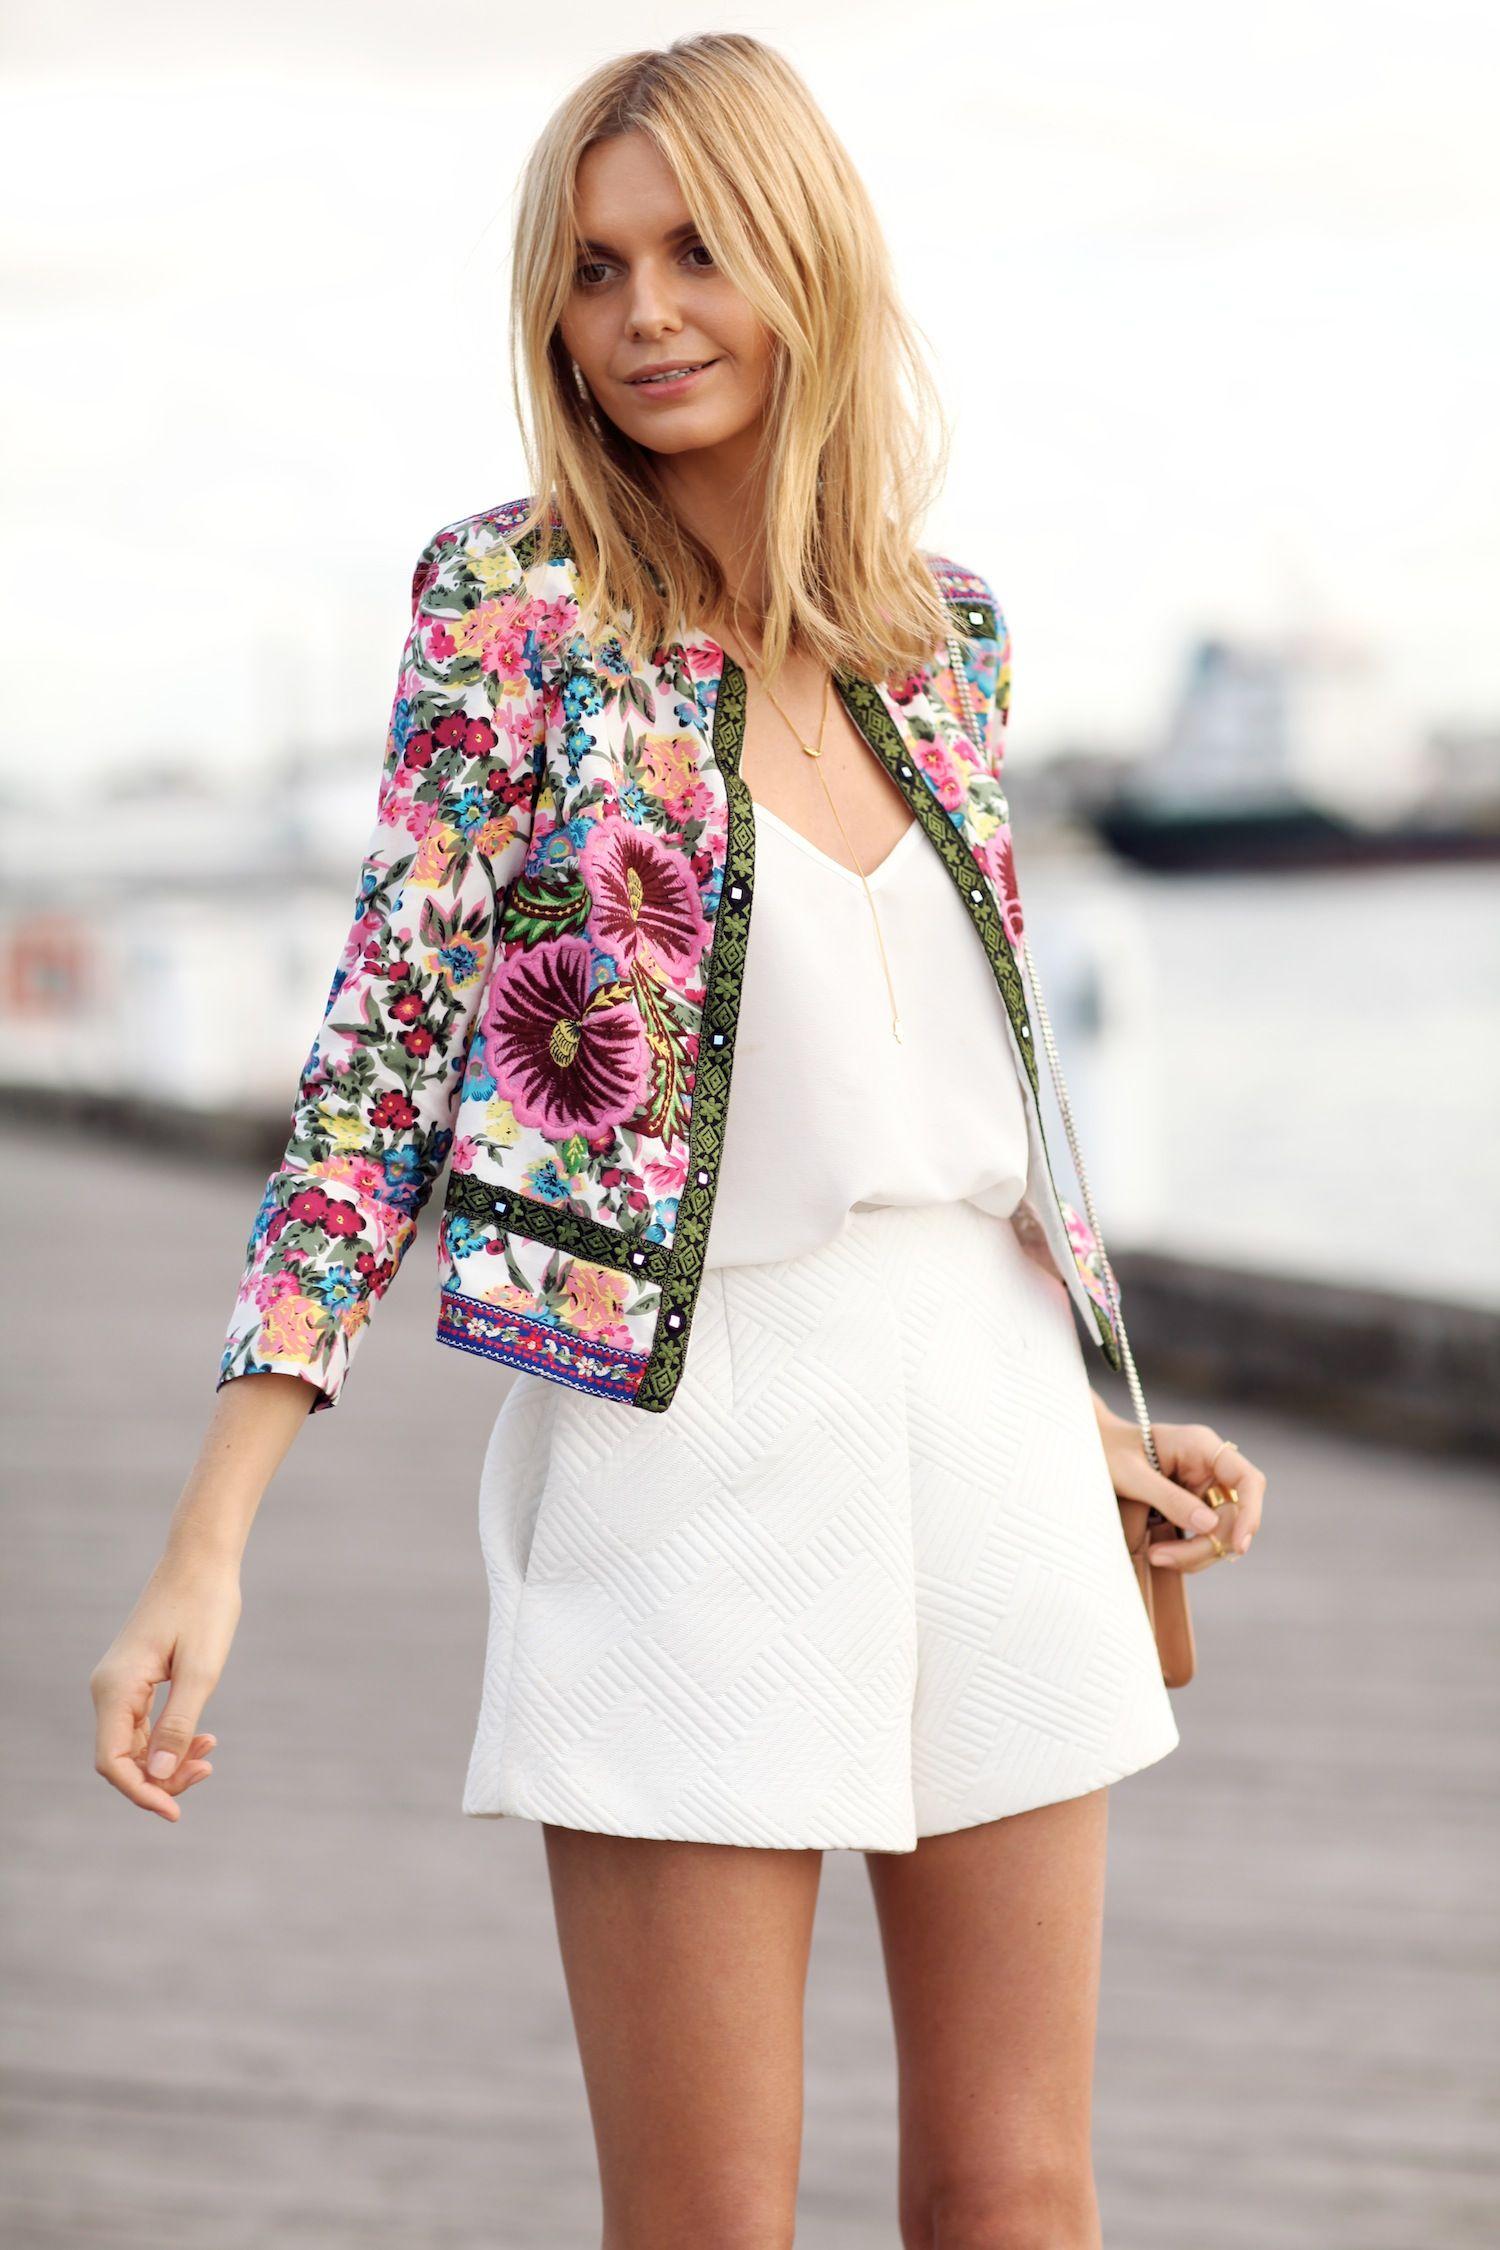 ASOS floral embroidered jacket, ASOS cami, ASOS high waisted shorts